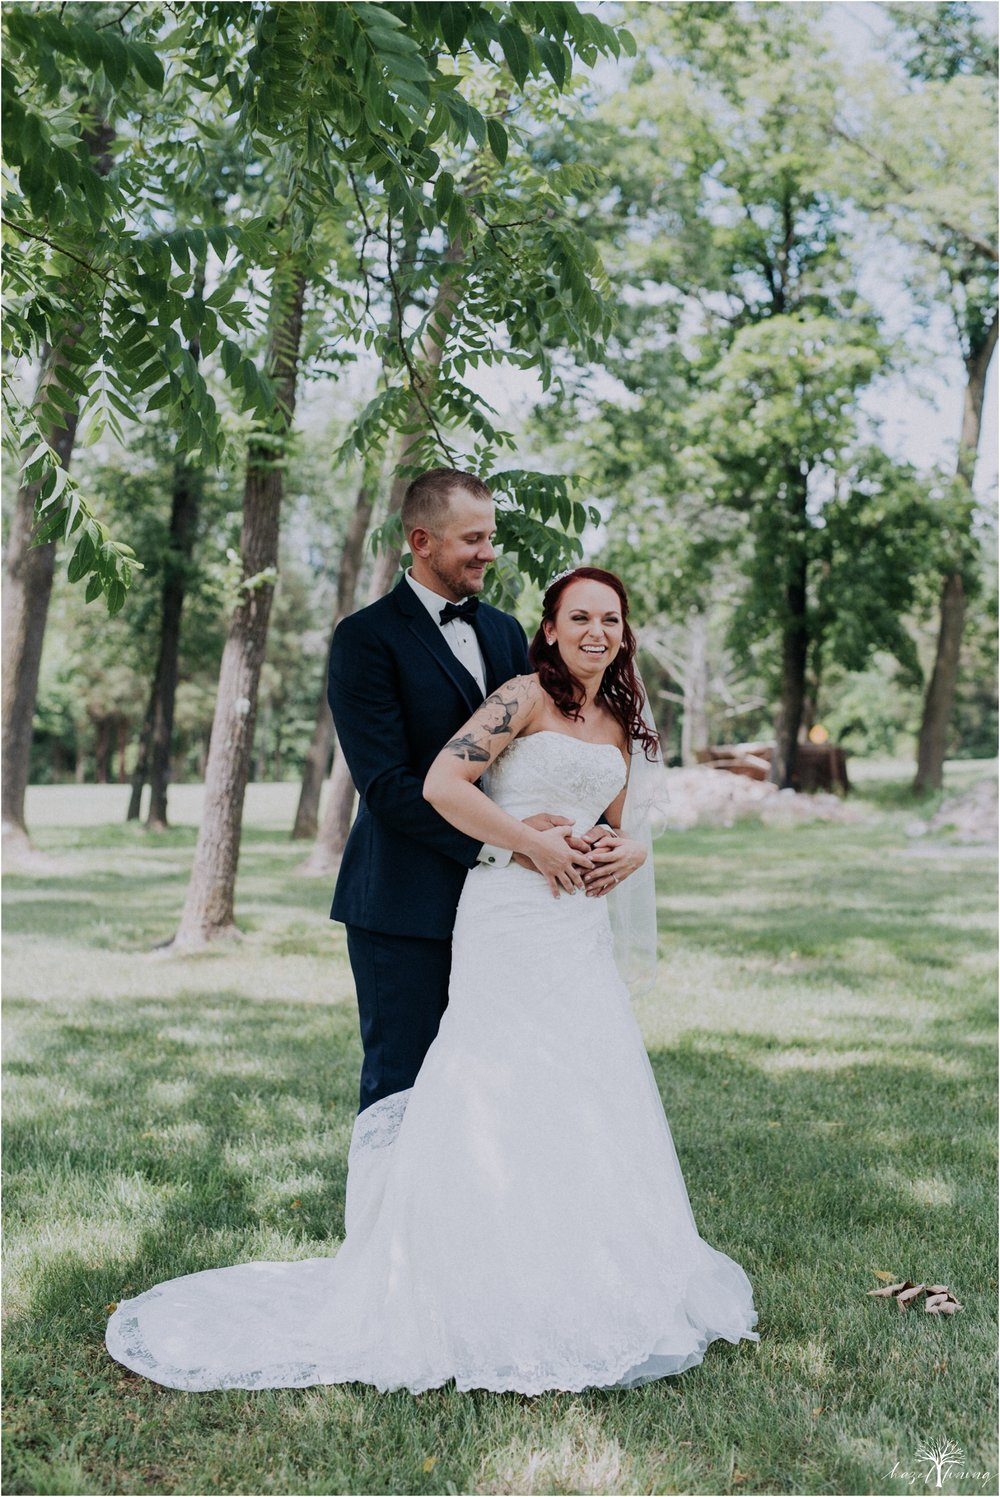 alyssa-james-stiteler-wedding-loft-and-sweet-water-cc-pennsburg-pennsylvania-hazel-lining-travel-wedding-elopement-photography_0038.jpg